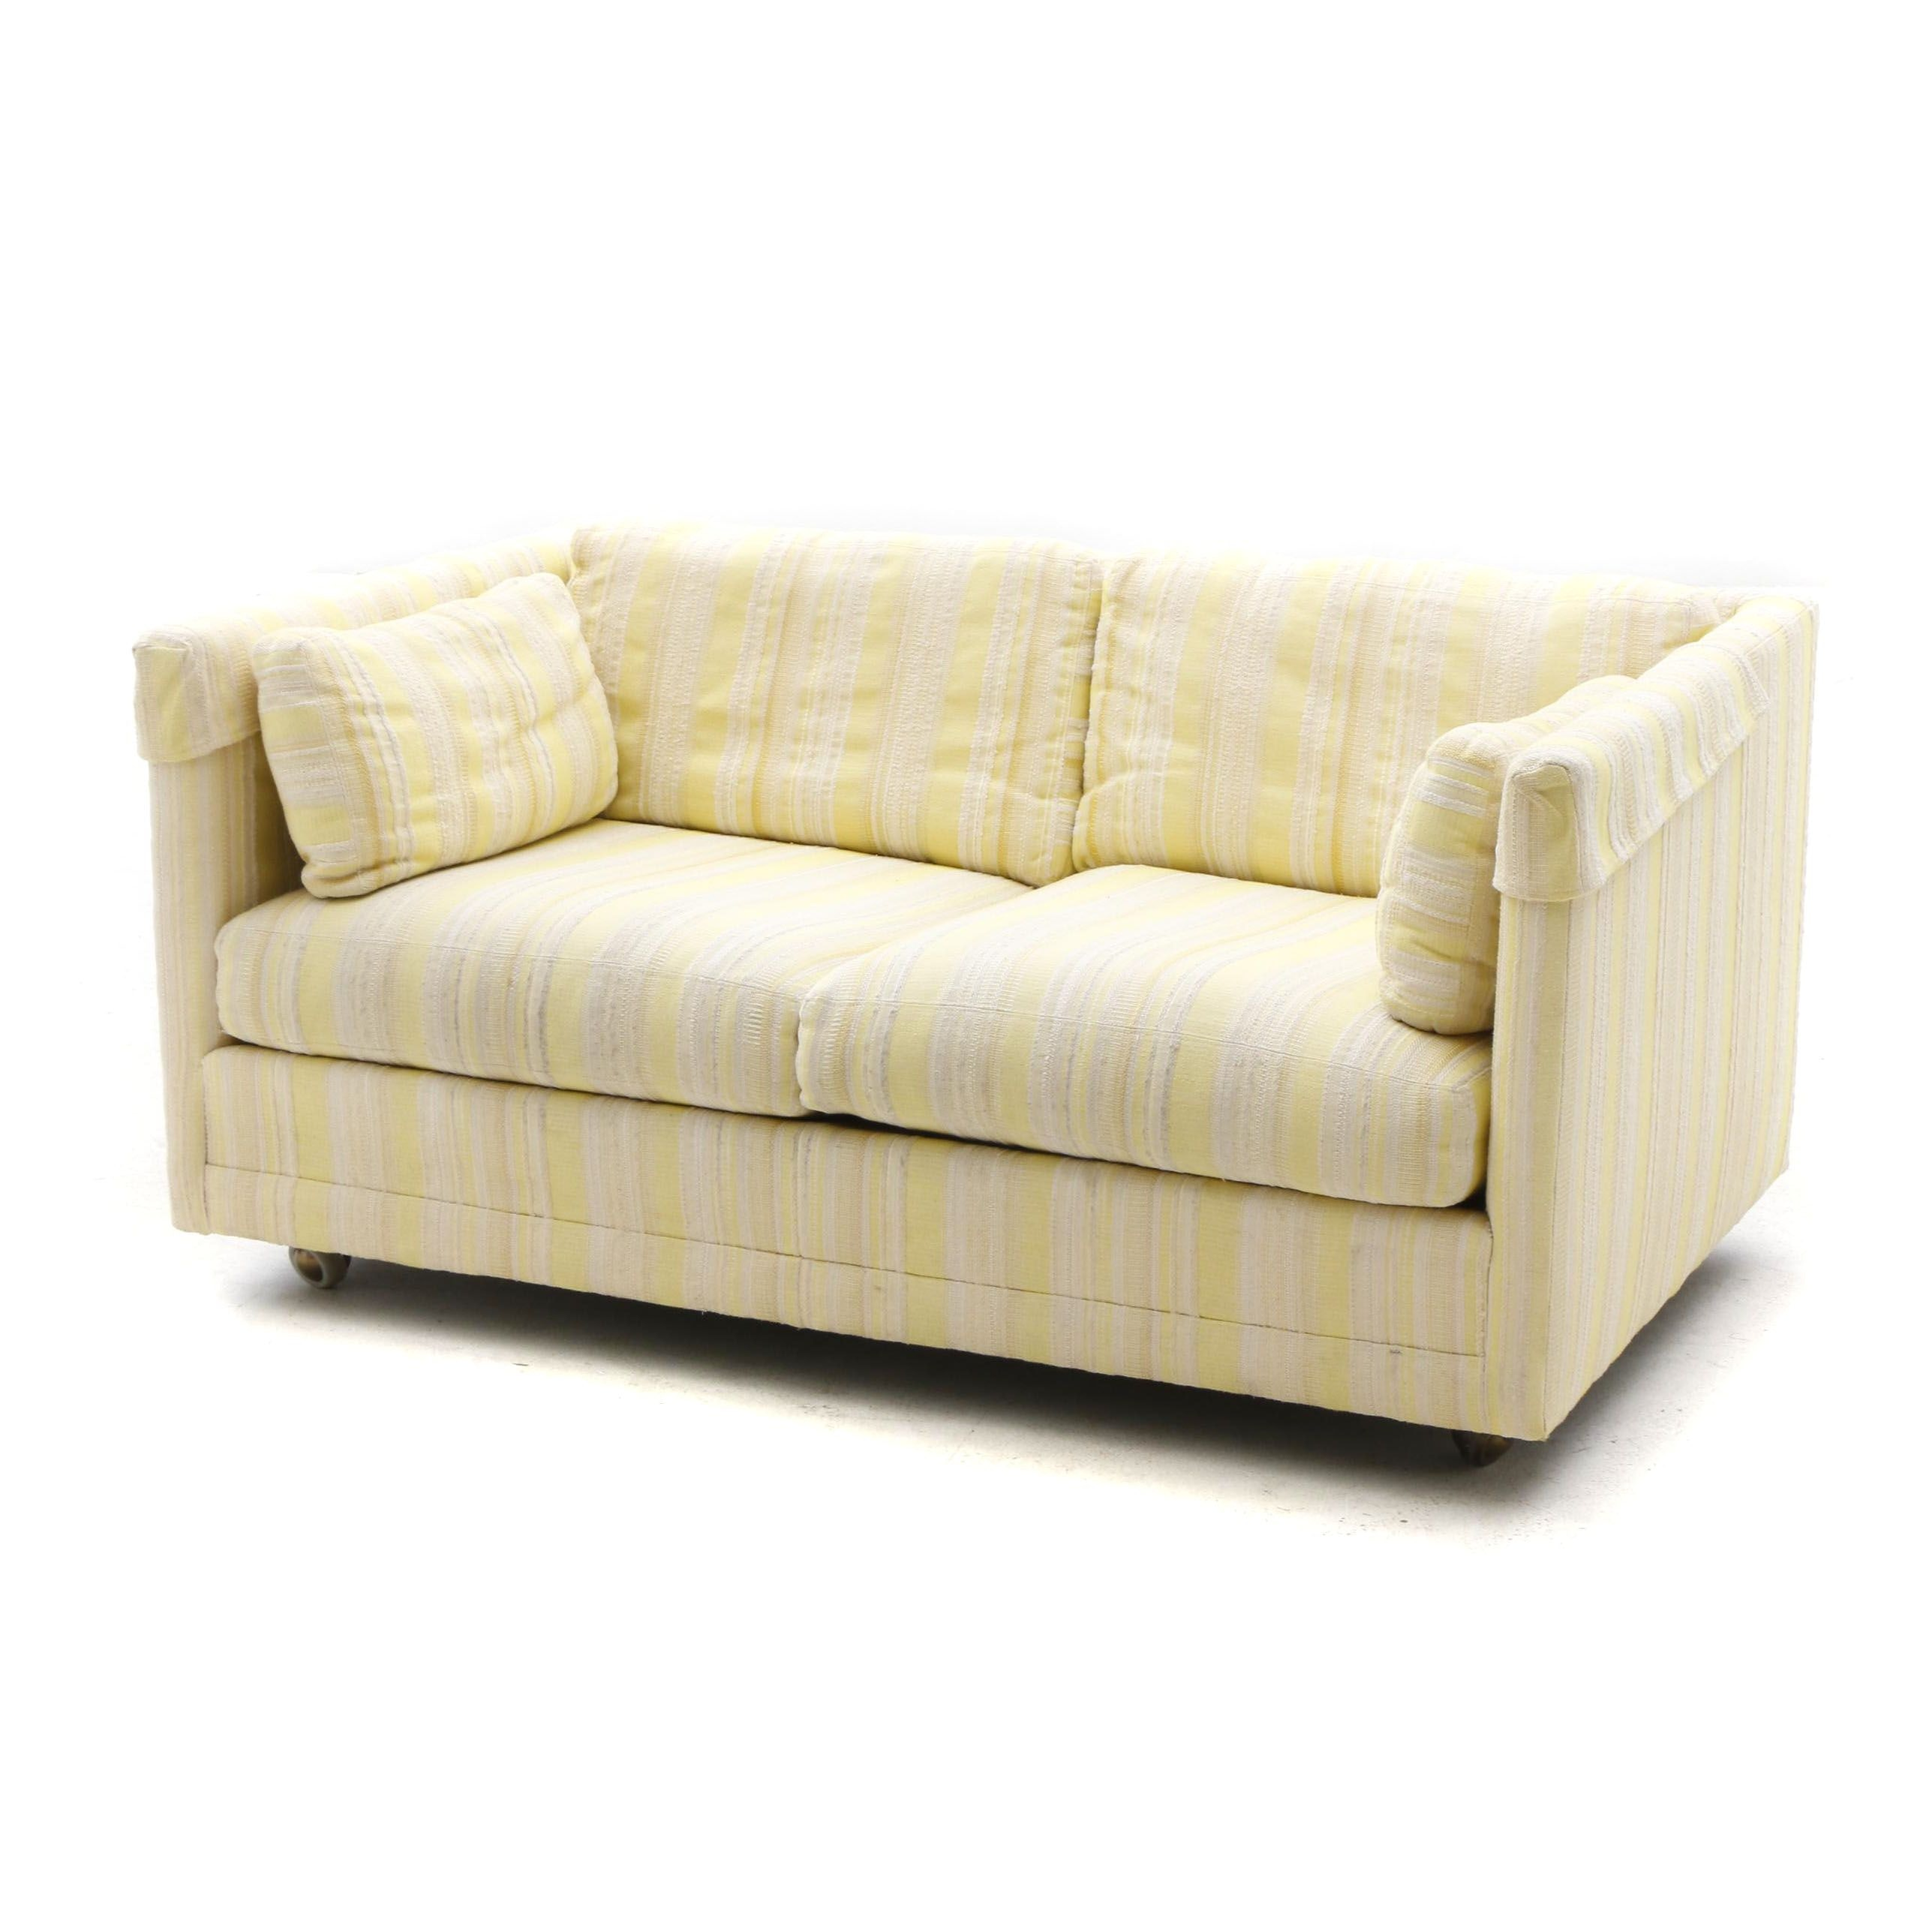 Vintage Loveseat by Drexel Furniture